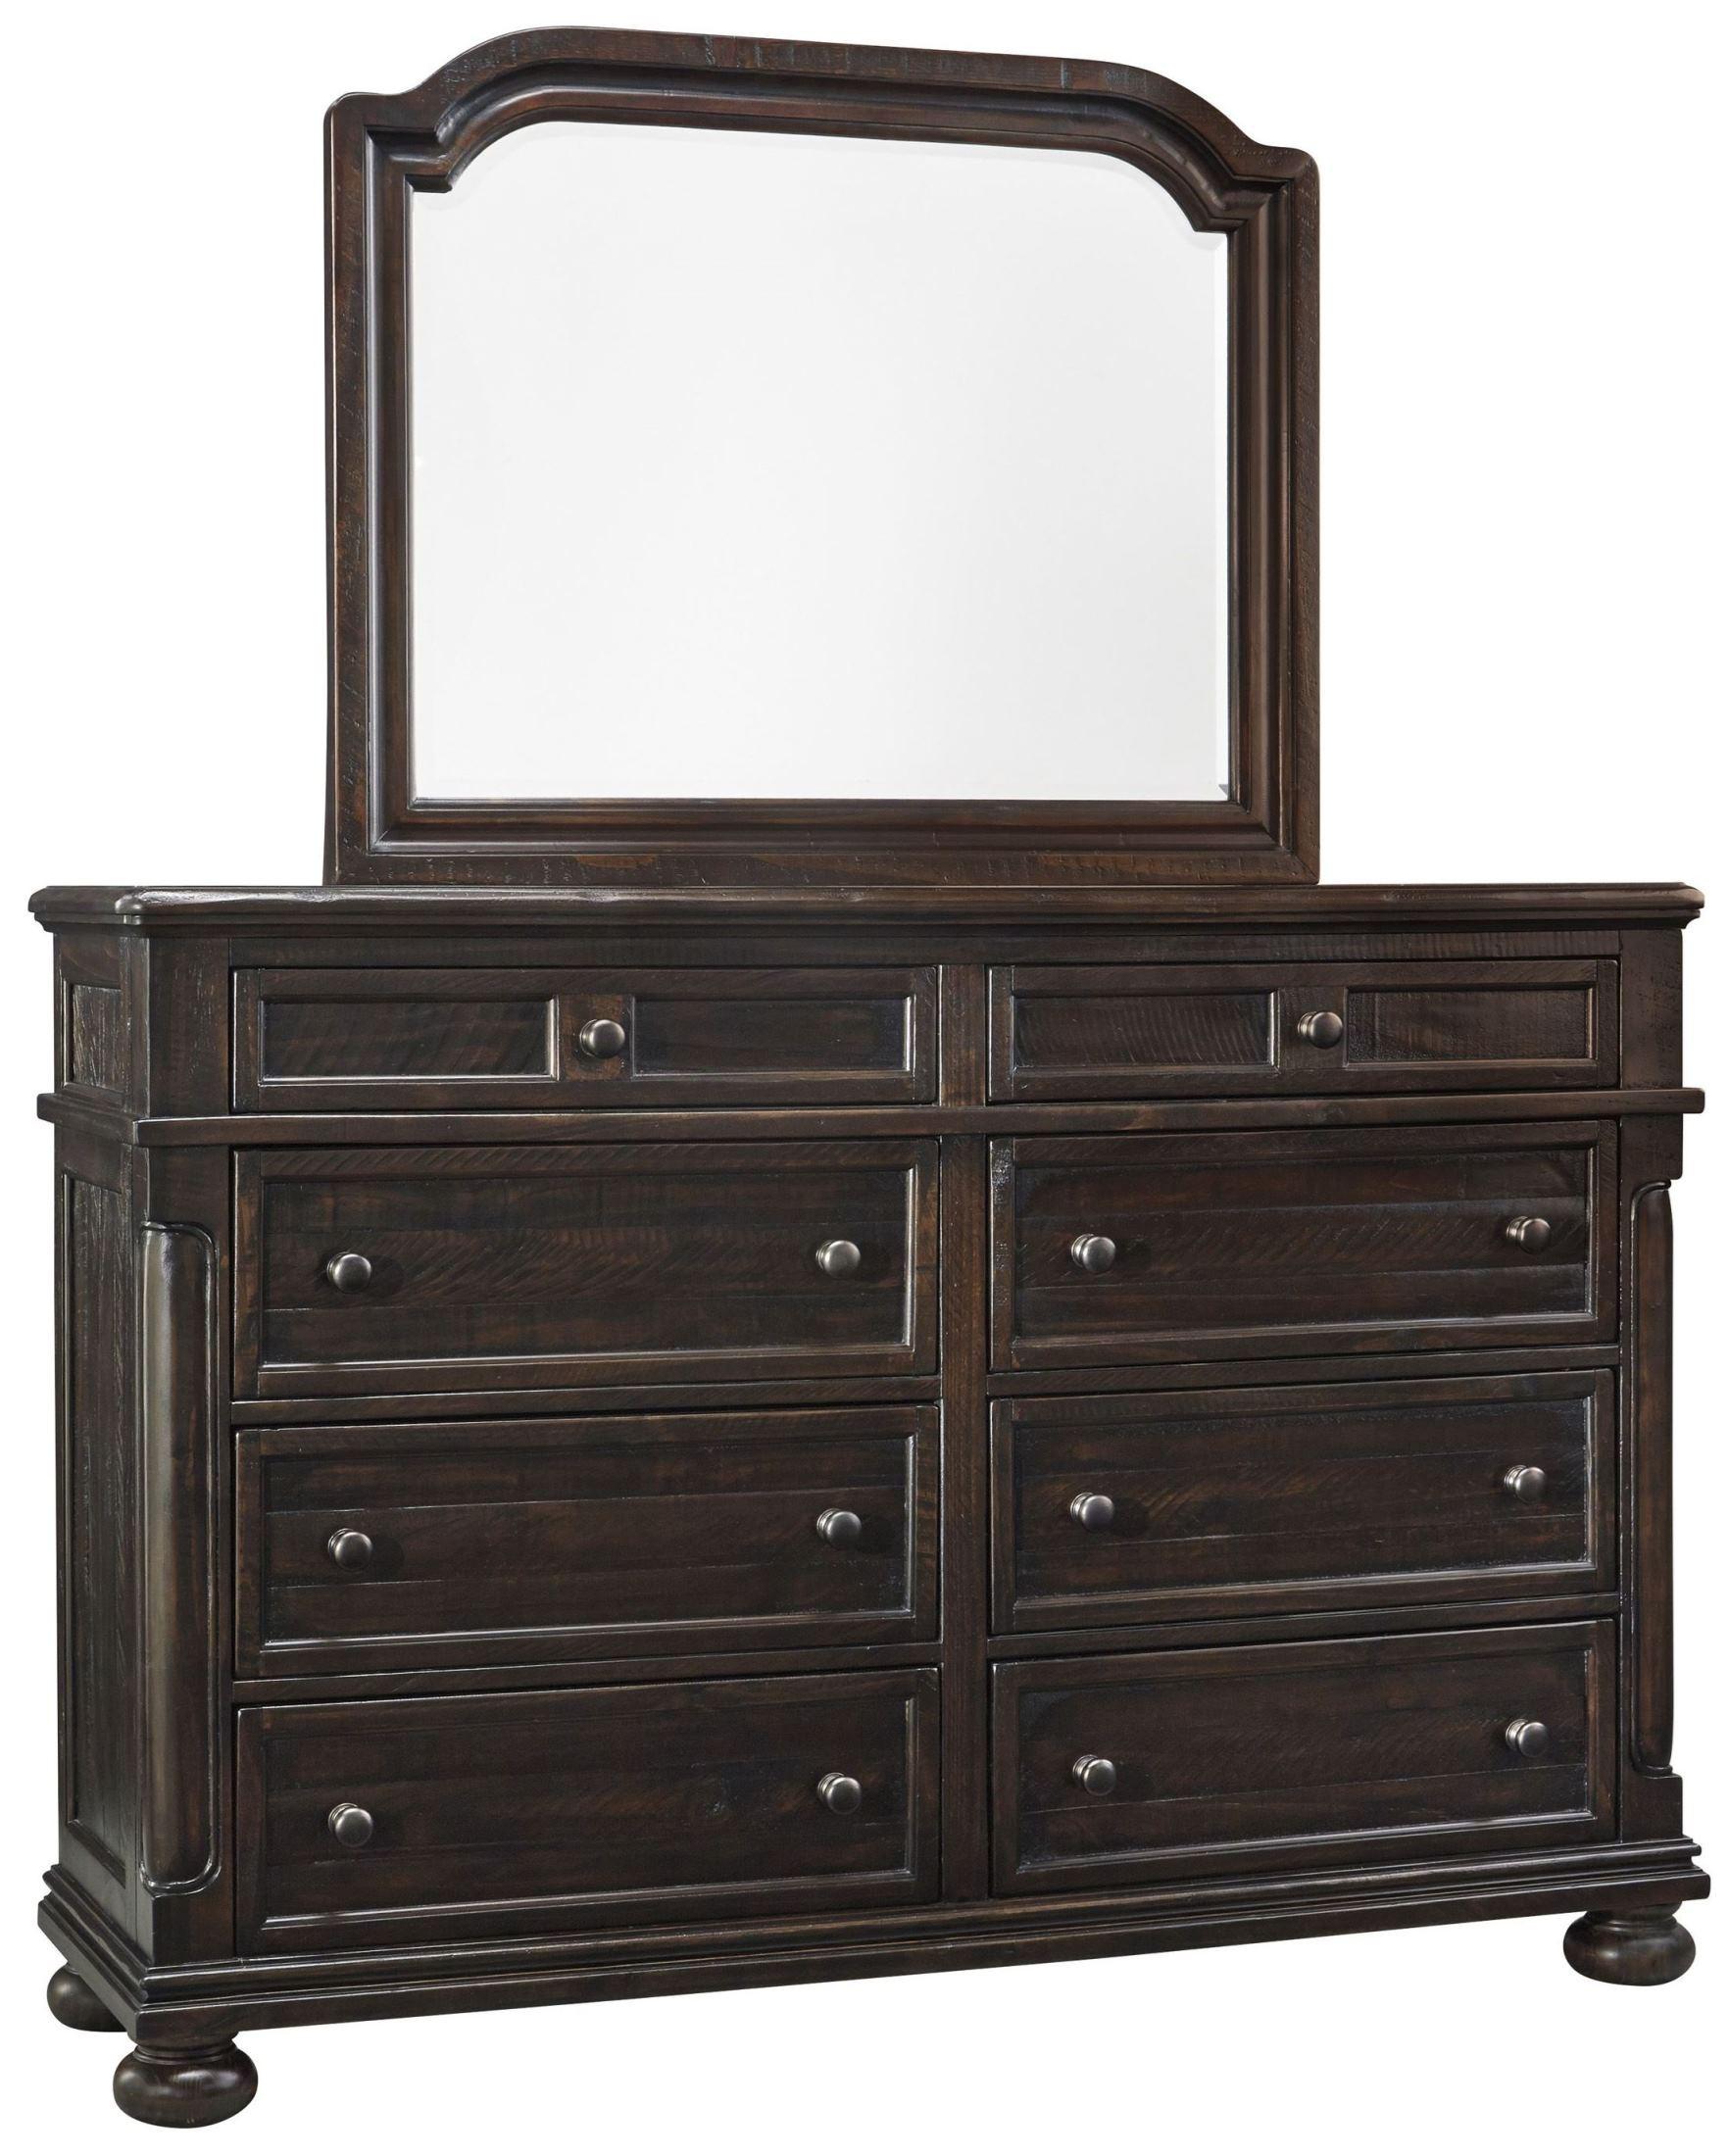 B657 77 Ashley Furniture Queen Upholstered Bed: Gerlane Graphite Upholstered Panel Bedroom Set, B657-74-77